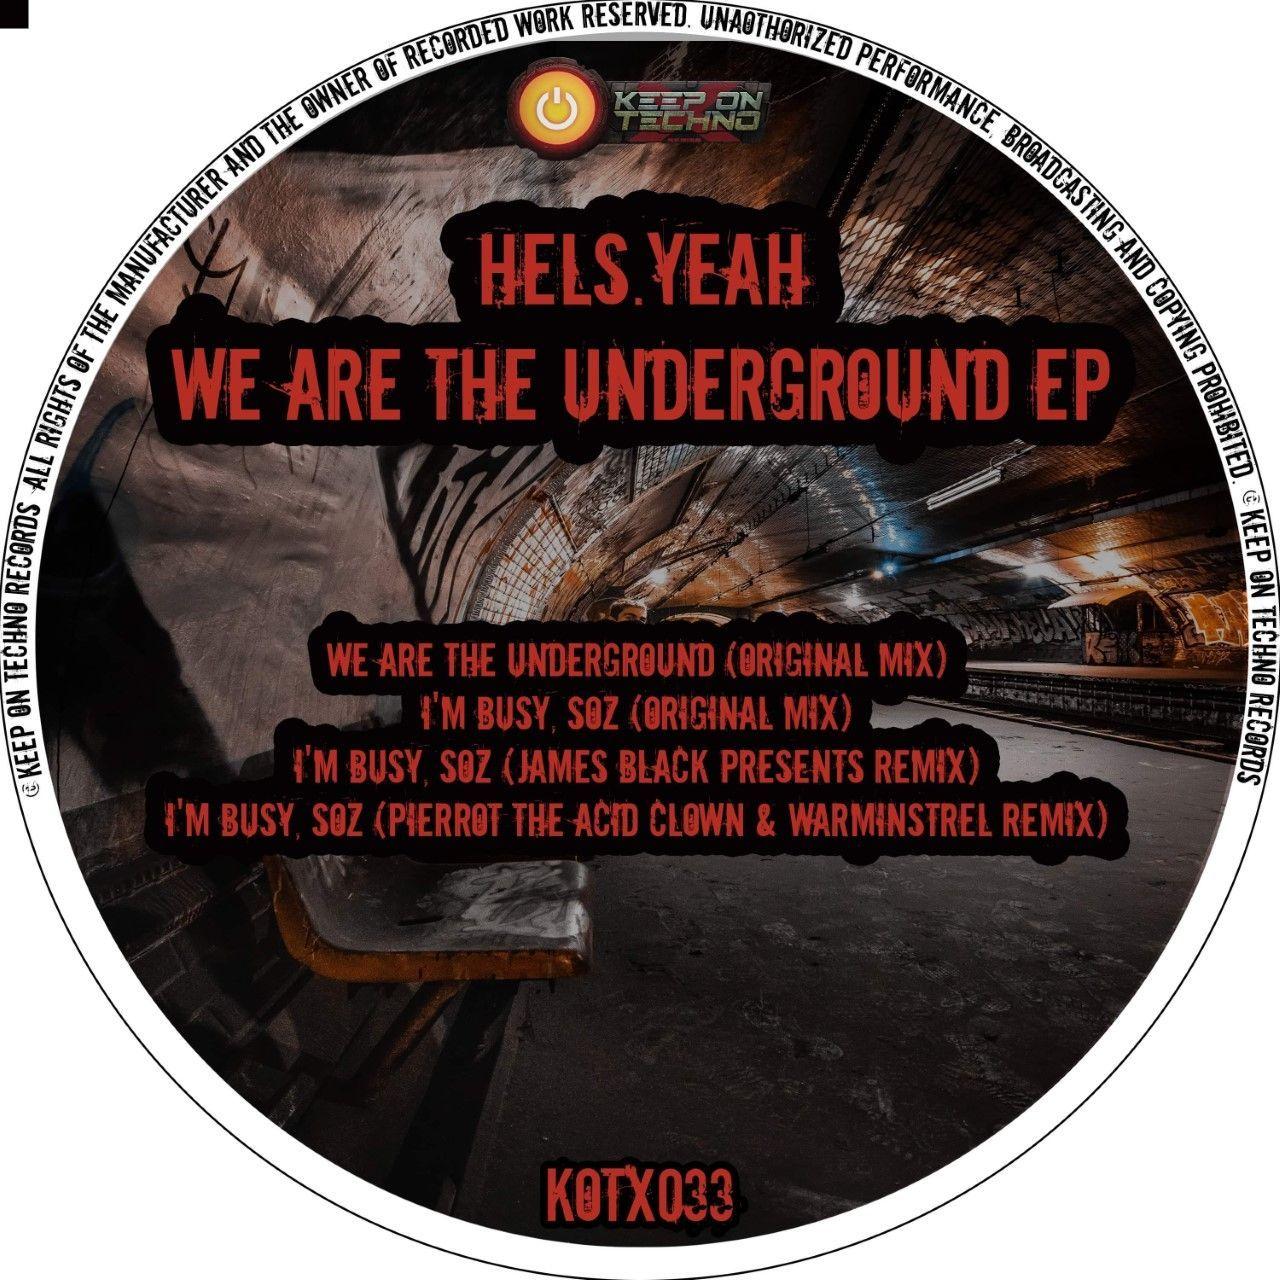 We are the underground artwork.jpg